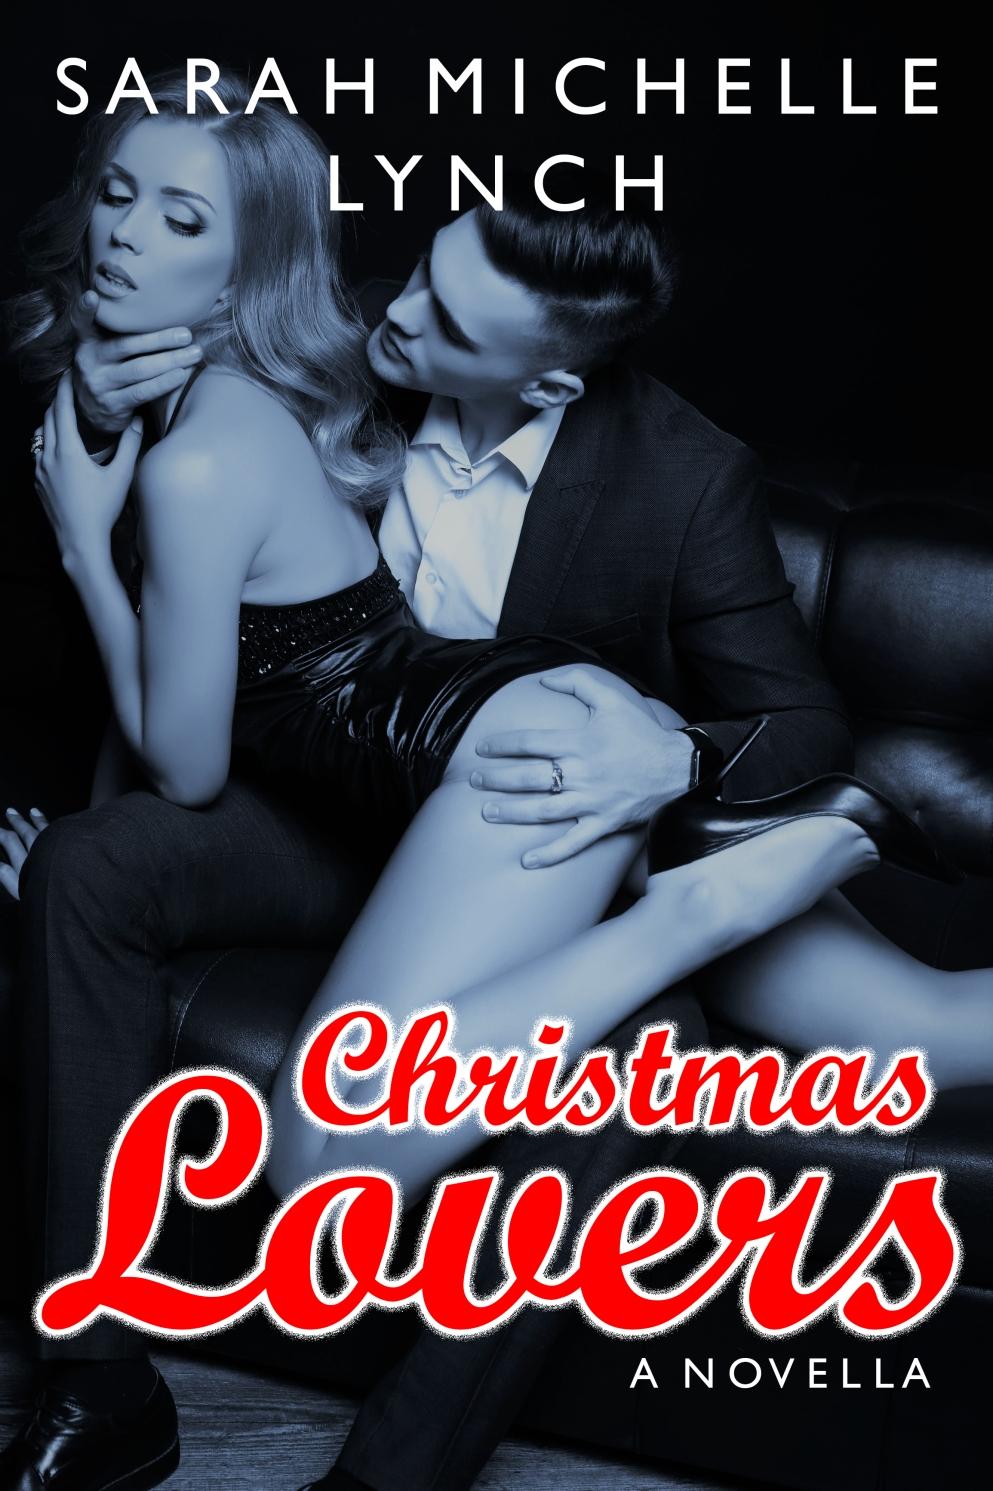 CHRISTMAS LOVERS